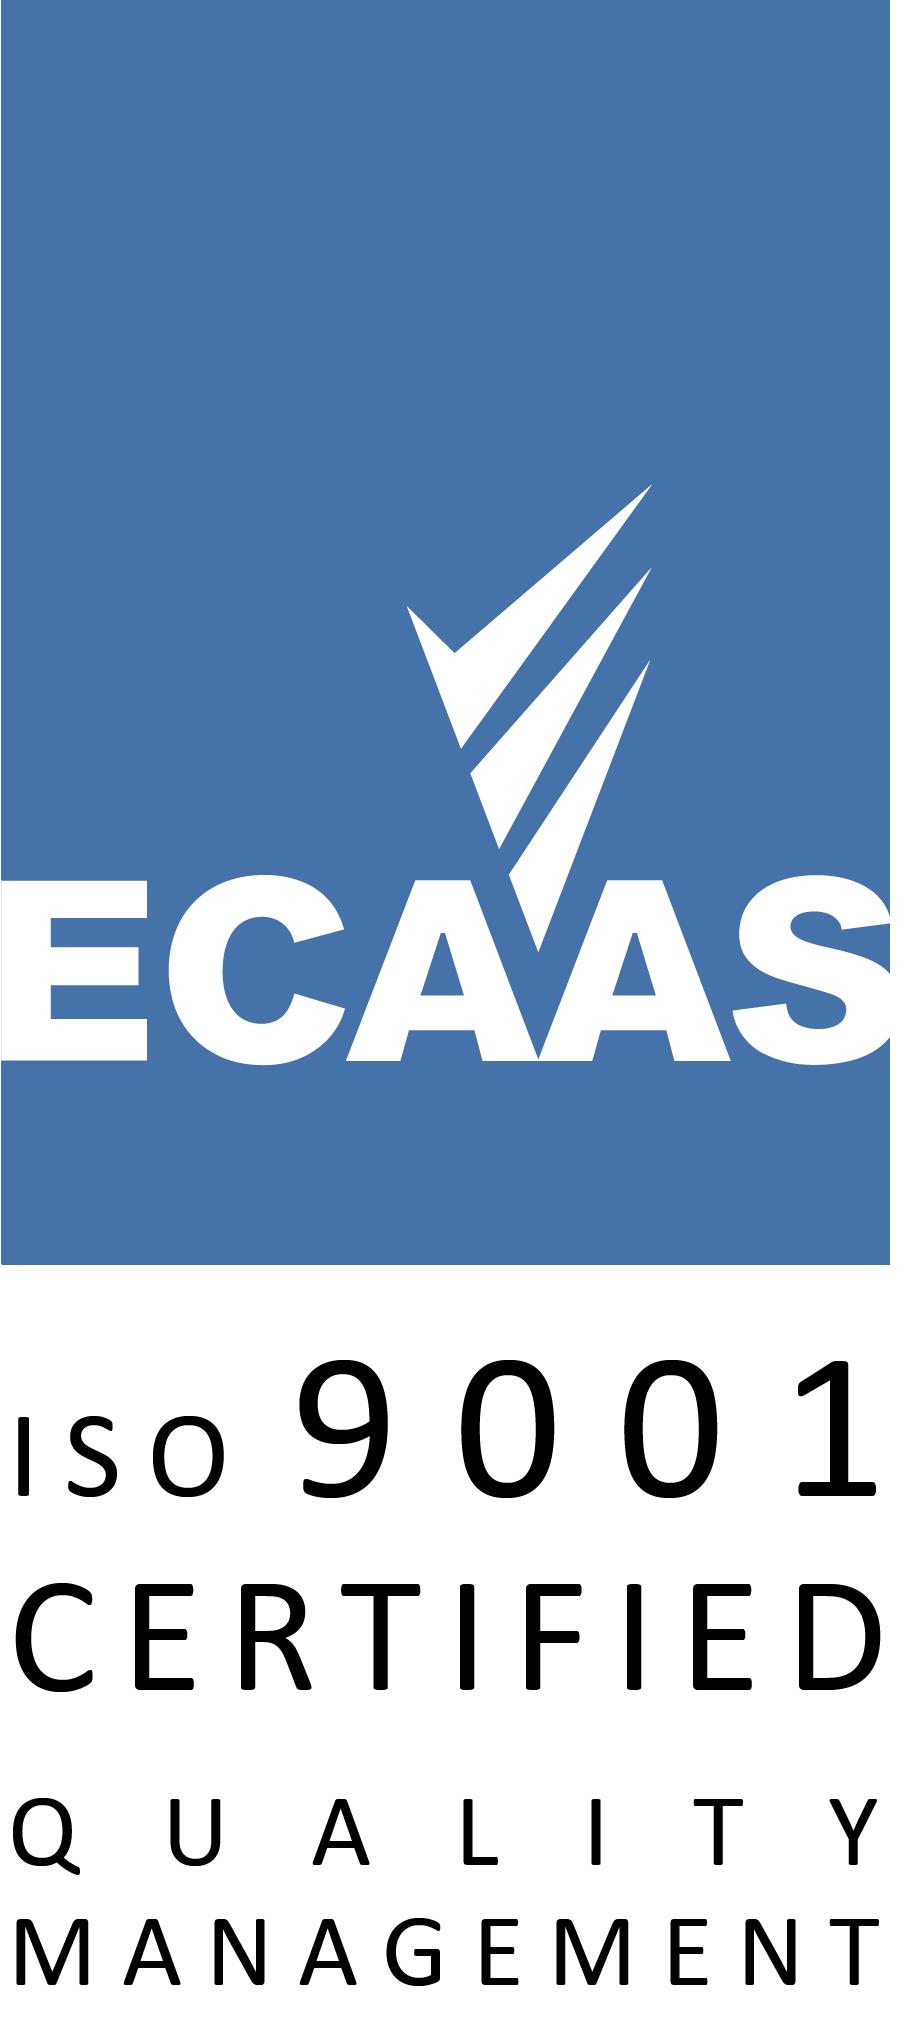 ECAAS Certification Mark - 9001 v3 Colour 300ppi.png